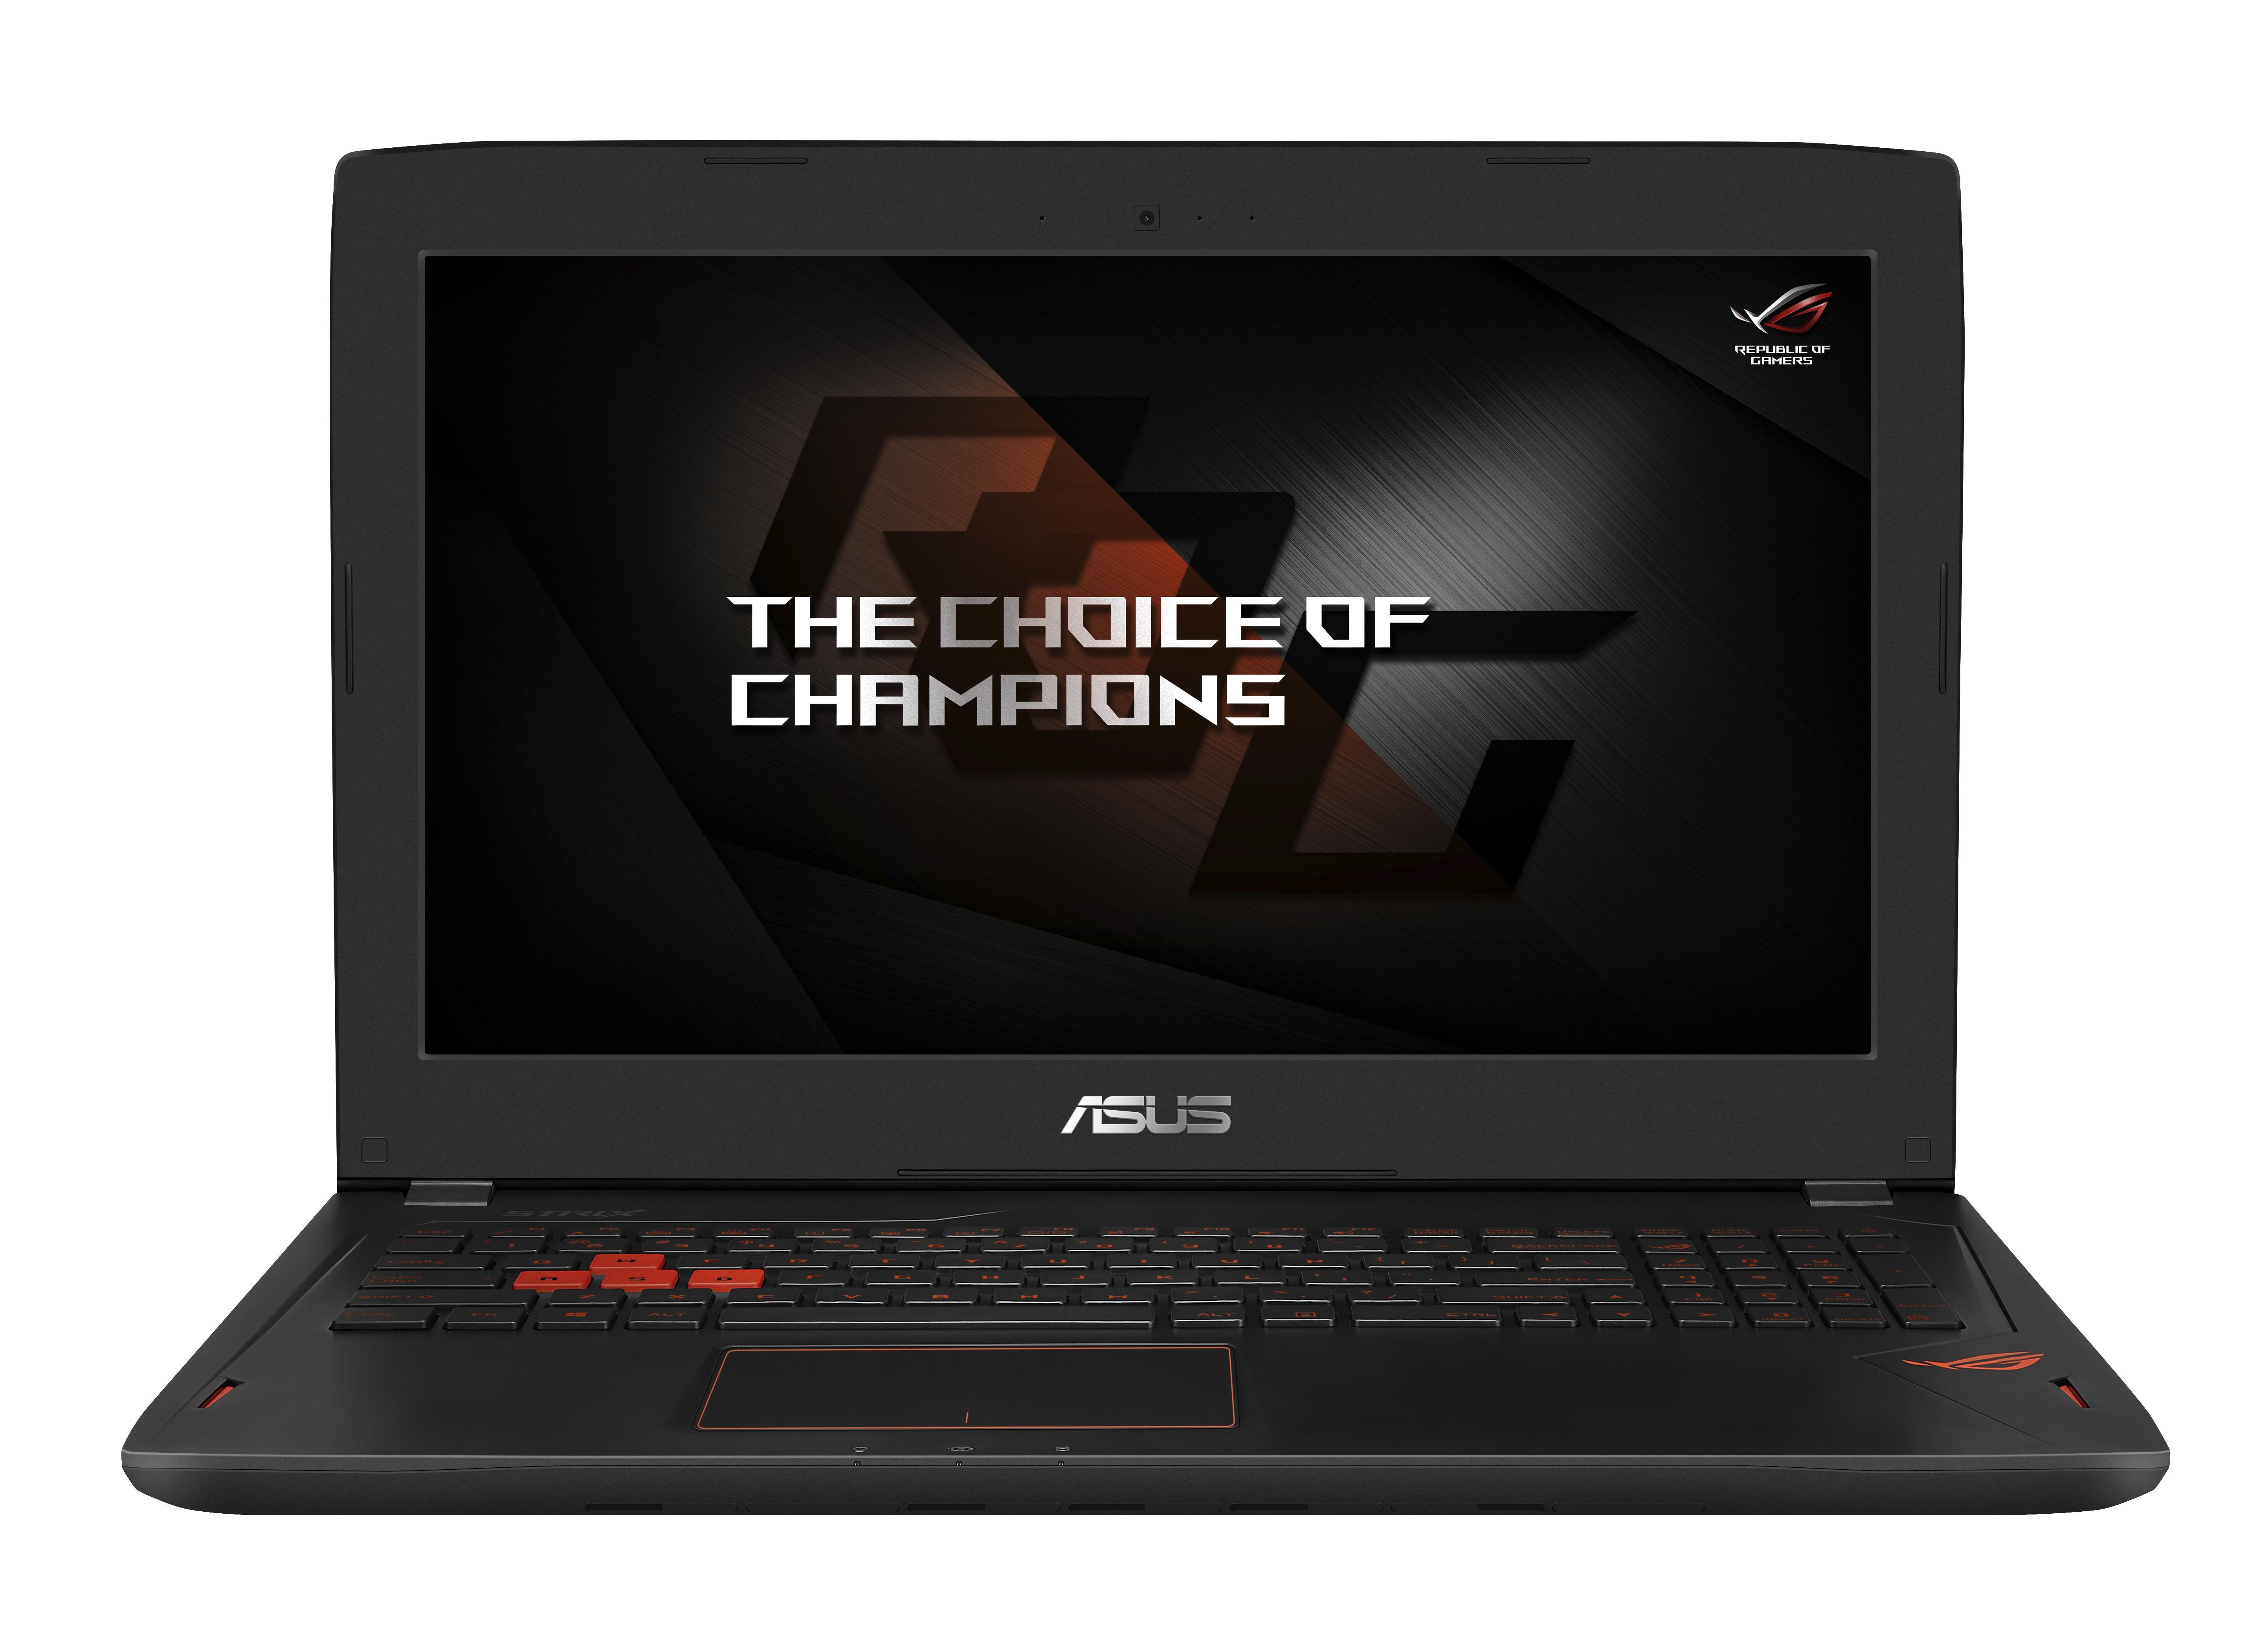 ASUS GL502VS 15.6/i7-7700HQ/1T+512SSD/32G/NV/W10